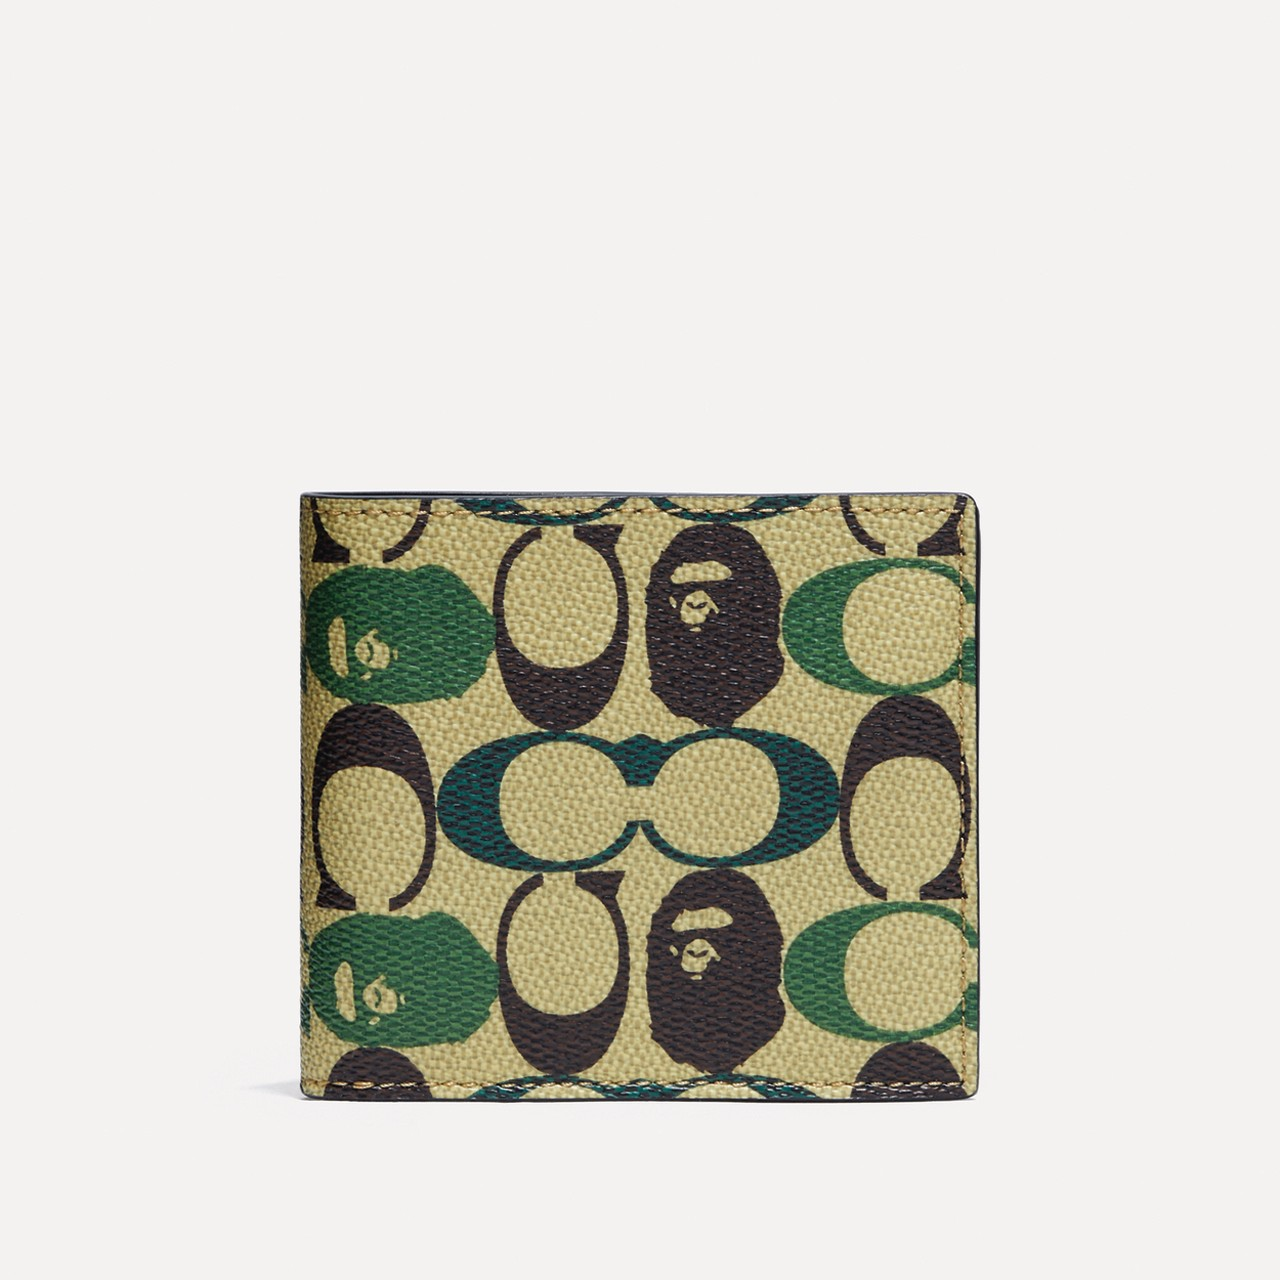 BAPE x Coach SS20 Full Collection and Lookbook Koki Quincy Brown Apehead Baby Milo Monogram